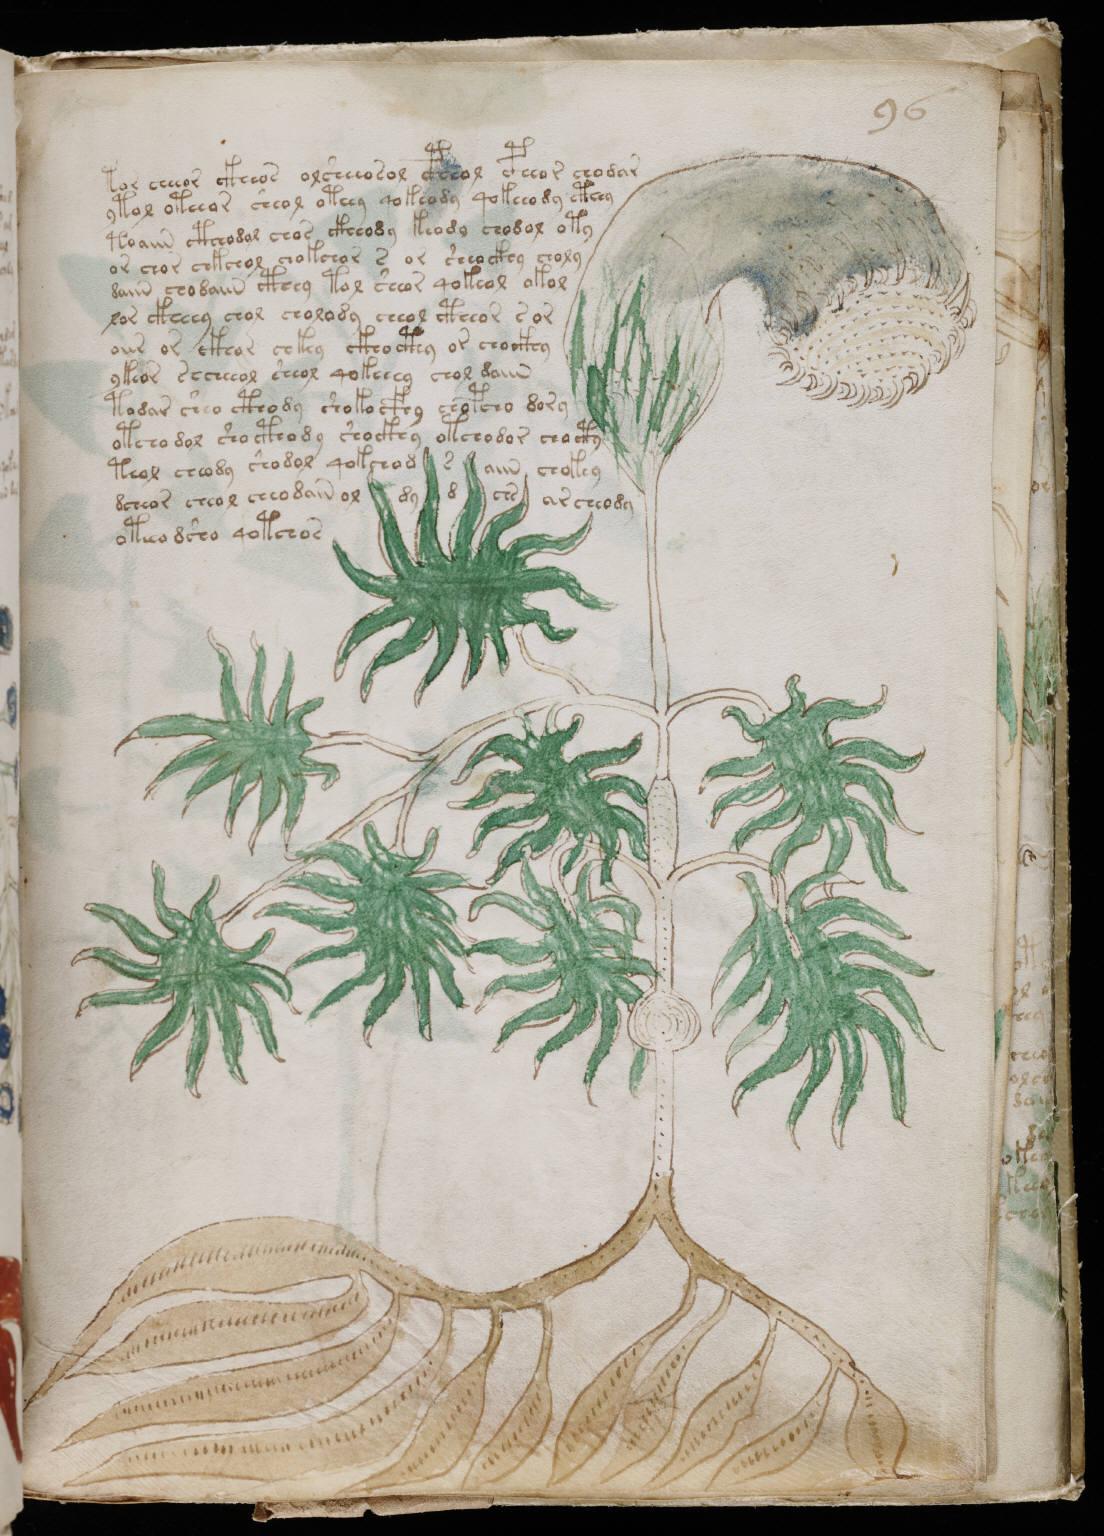 https://upload.wikimedia.org/wikipedia/commons/4/42/Voynich_Manuscript_(173).jpg